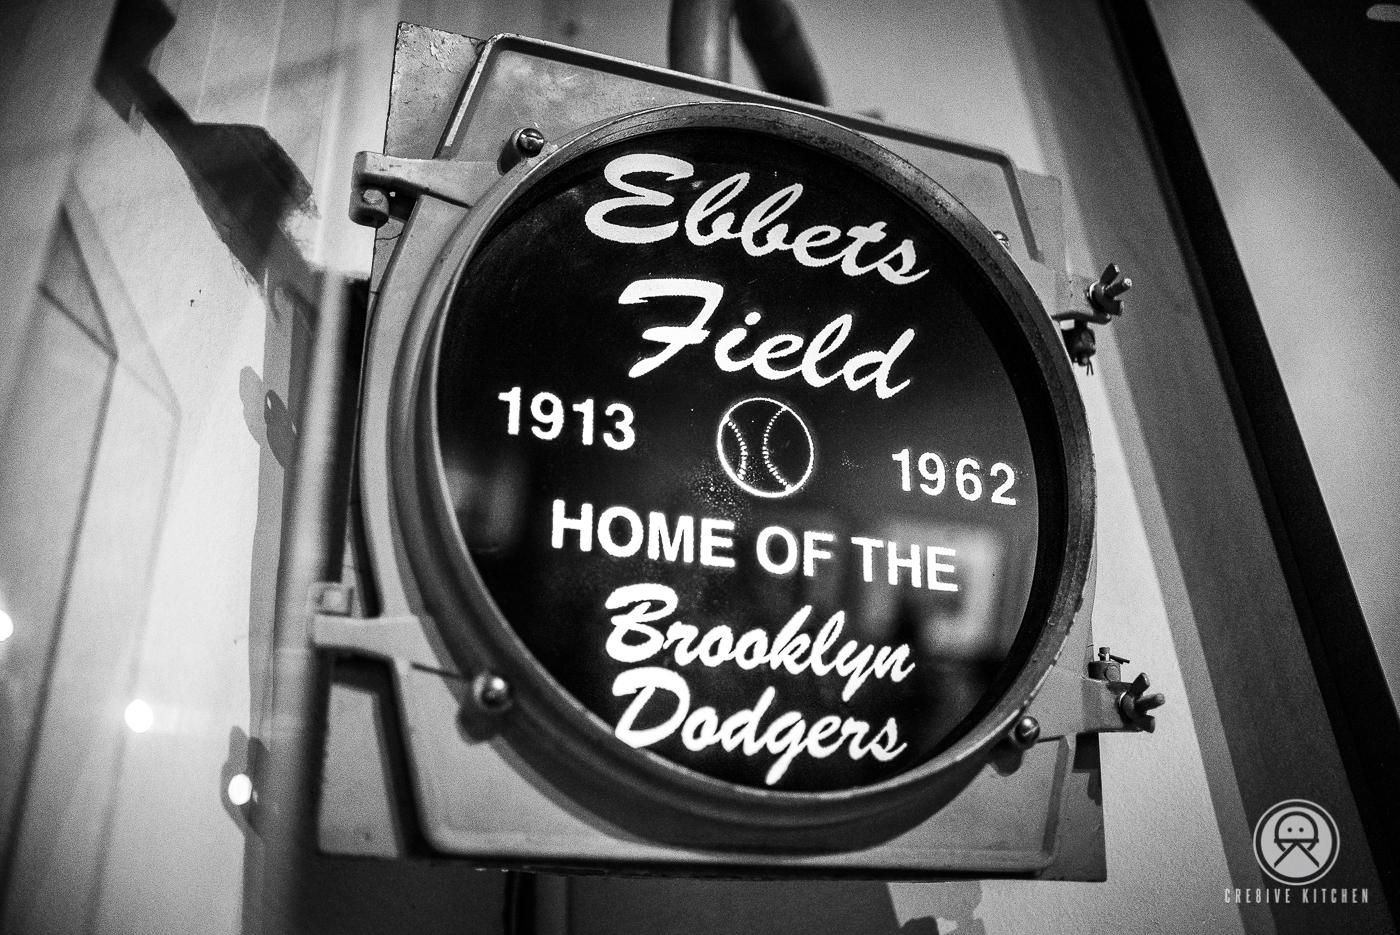 Dodgers-0762.jpg